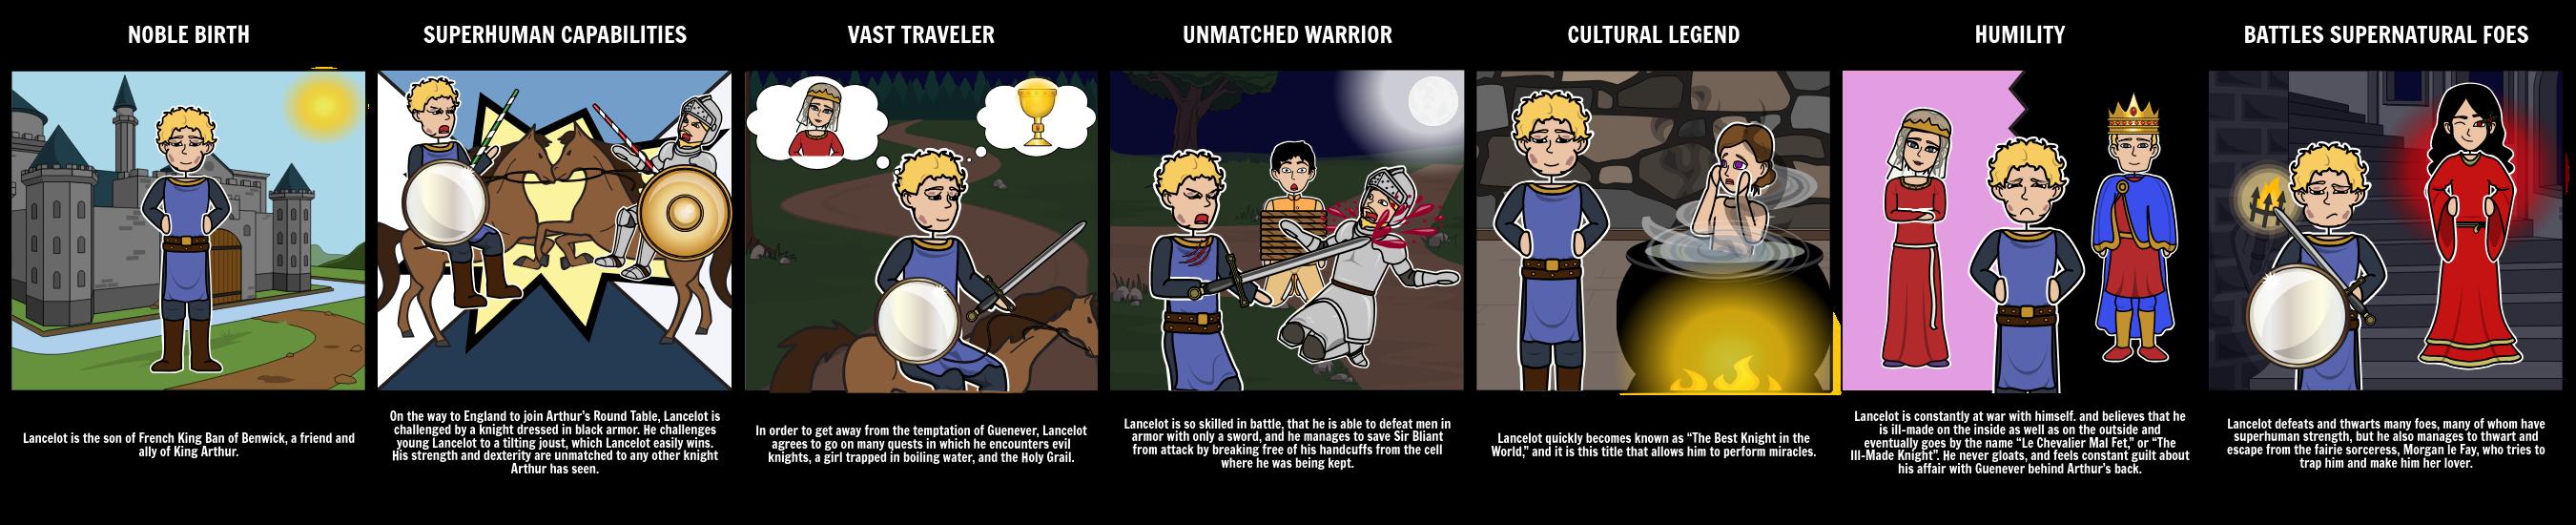 types of heroes hero archetype tragic hero anti hero